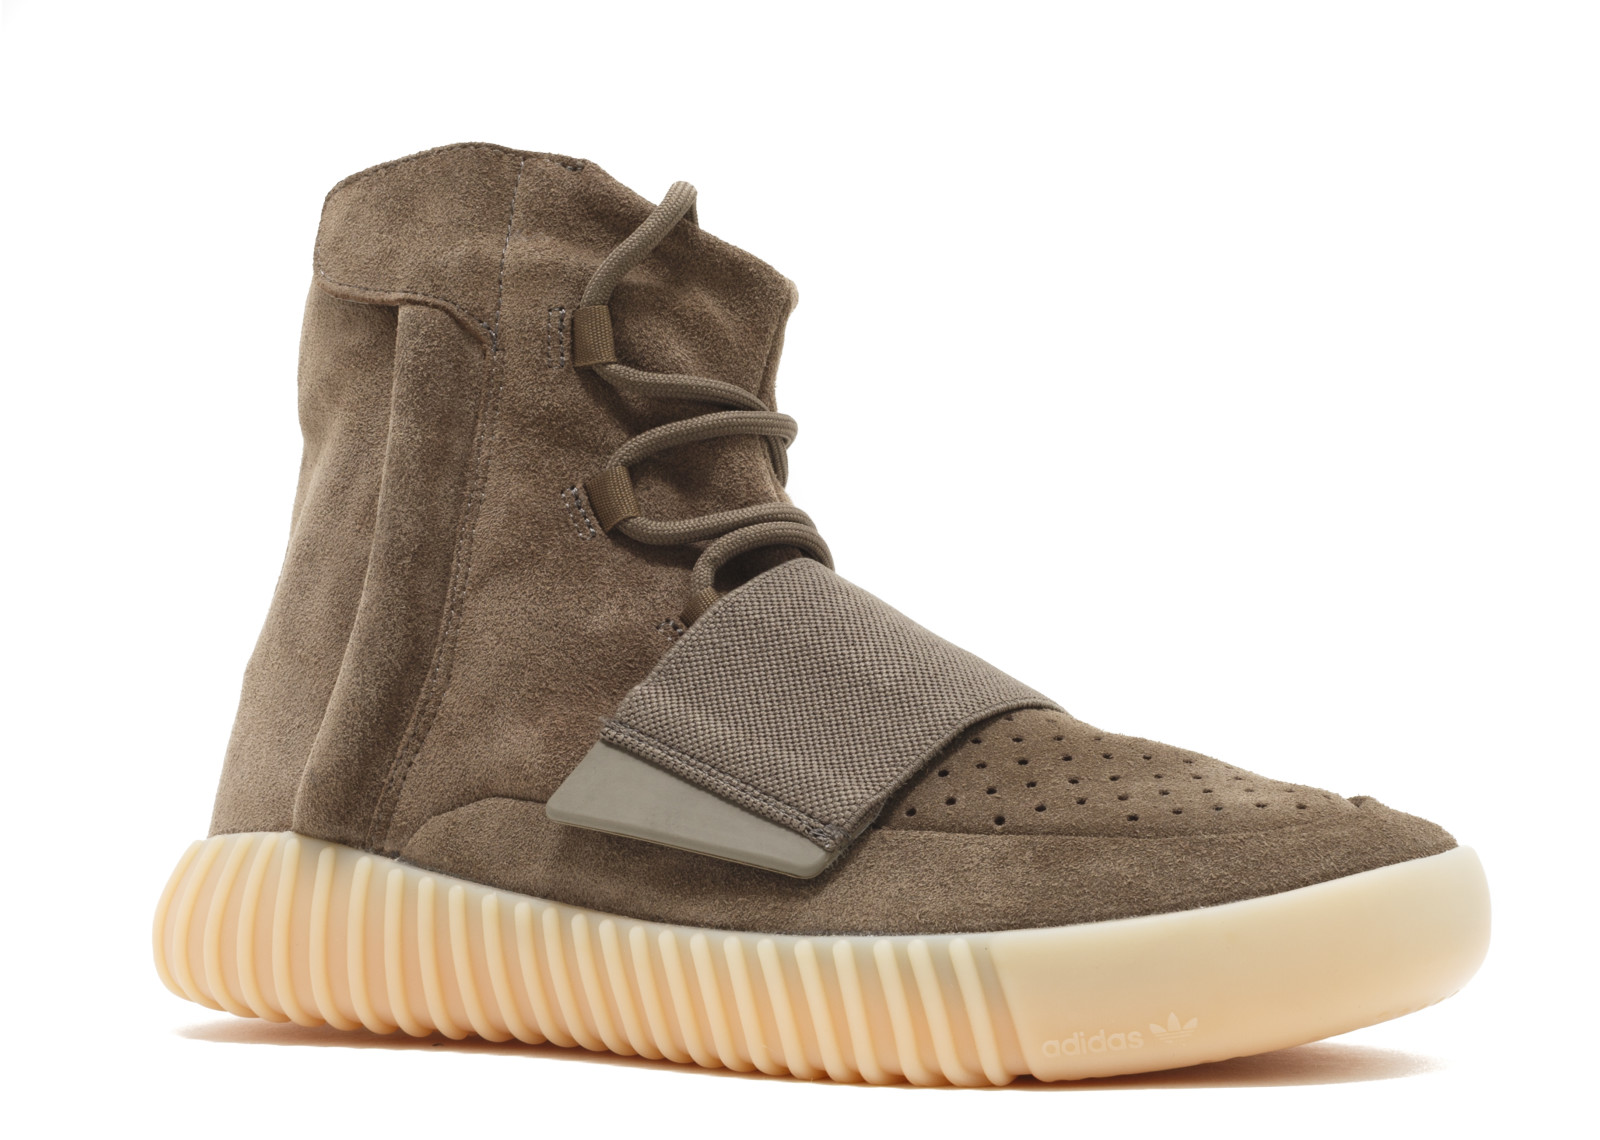 adidas Yeezy Boost 750 - BY2456 - Size 8.5 - A78Z0lG